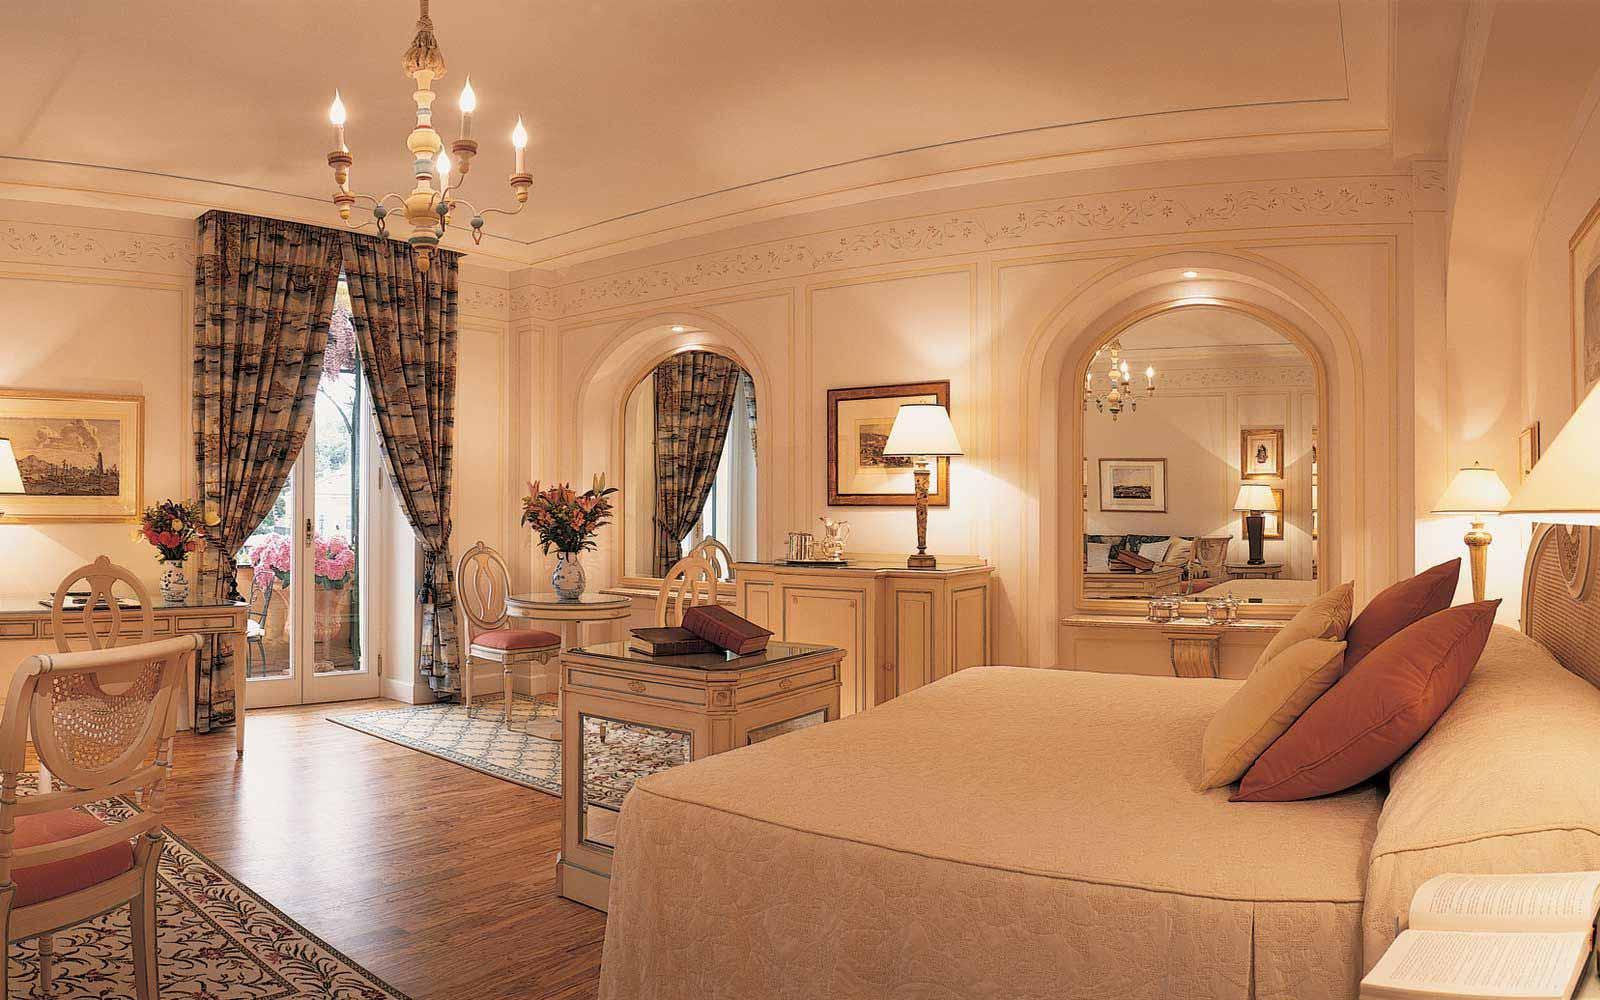 Exclusive Suite at HBelmond Hotel Splendido & Splendido Mare